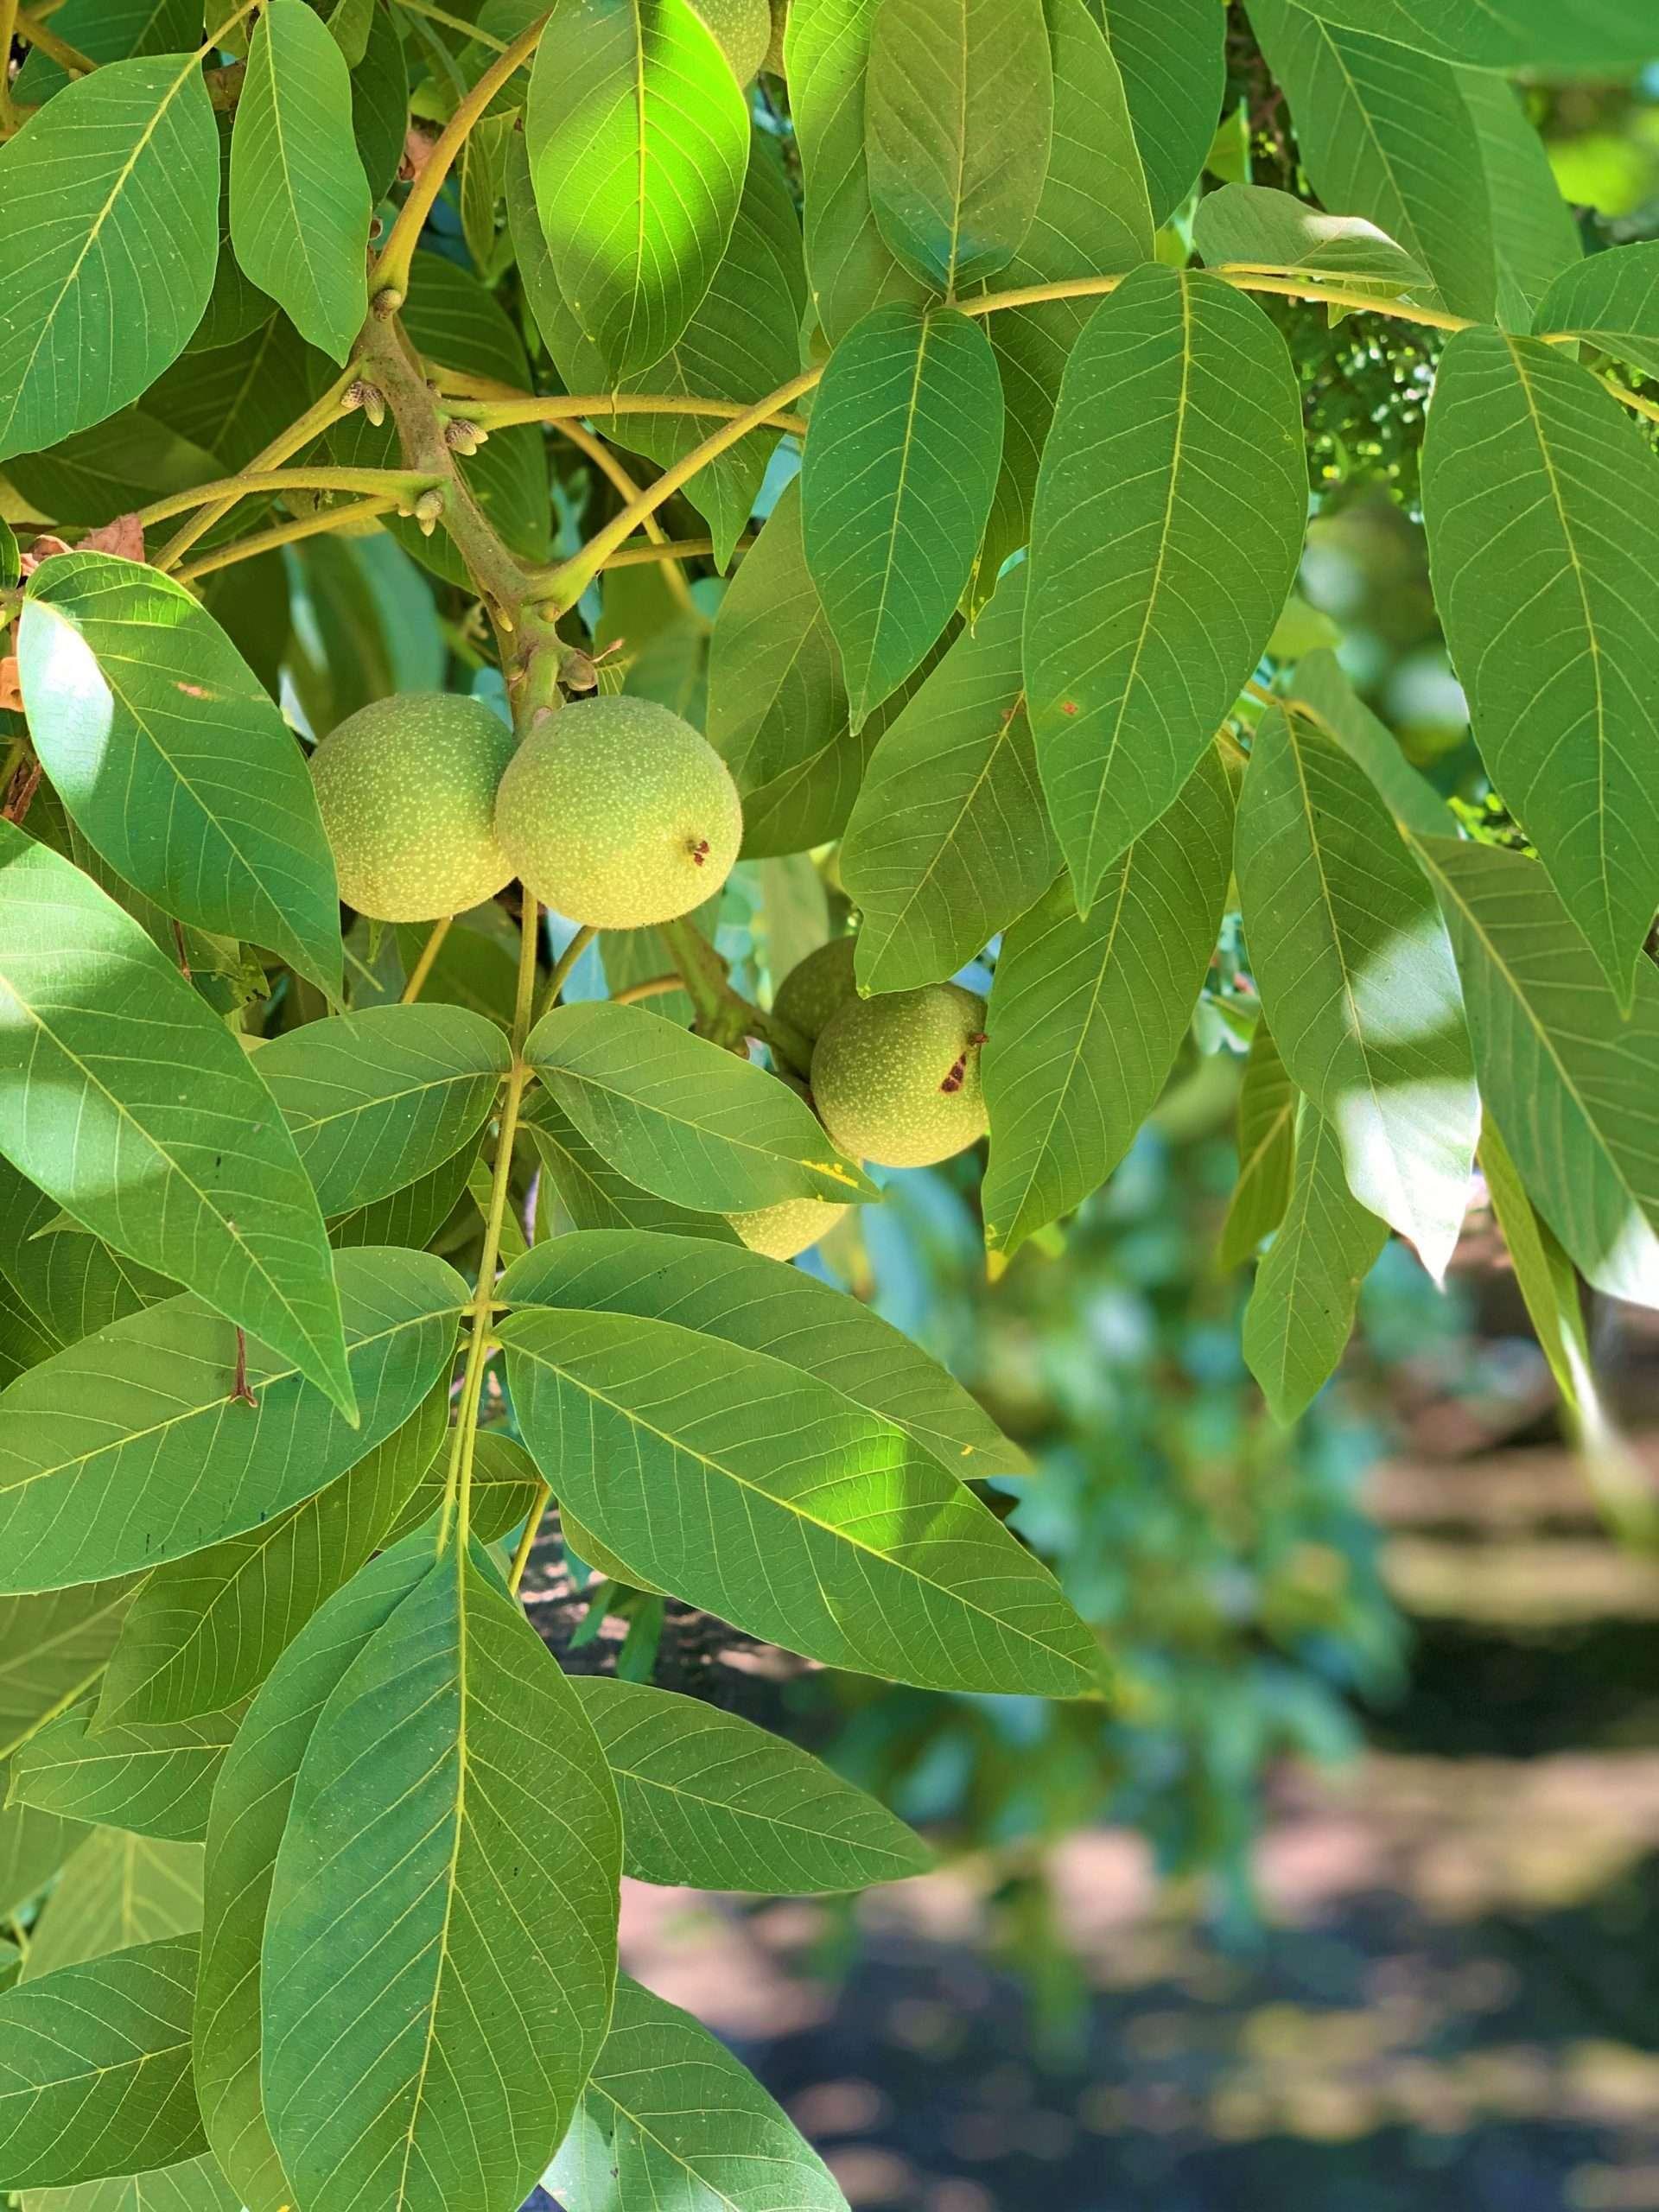 West Tulare Walnuts